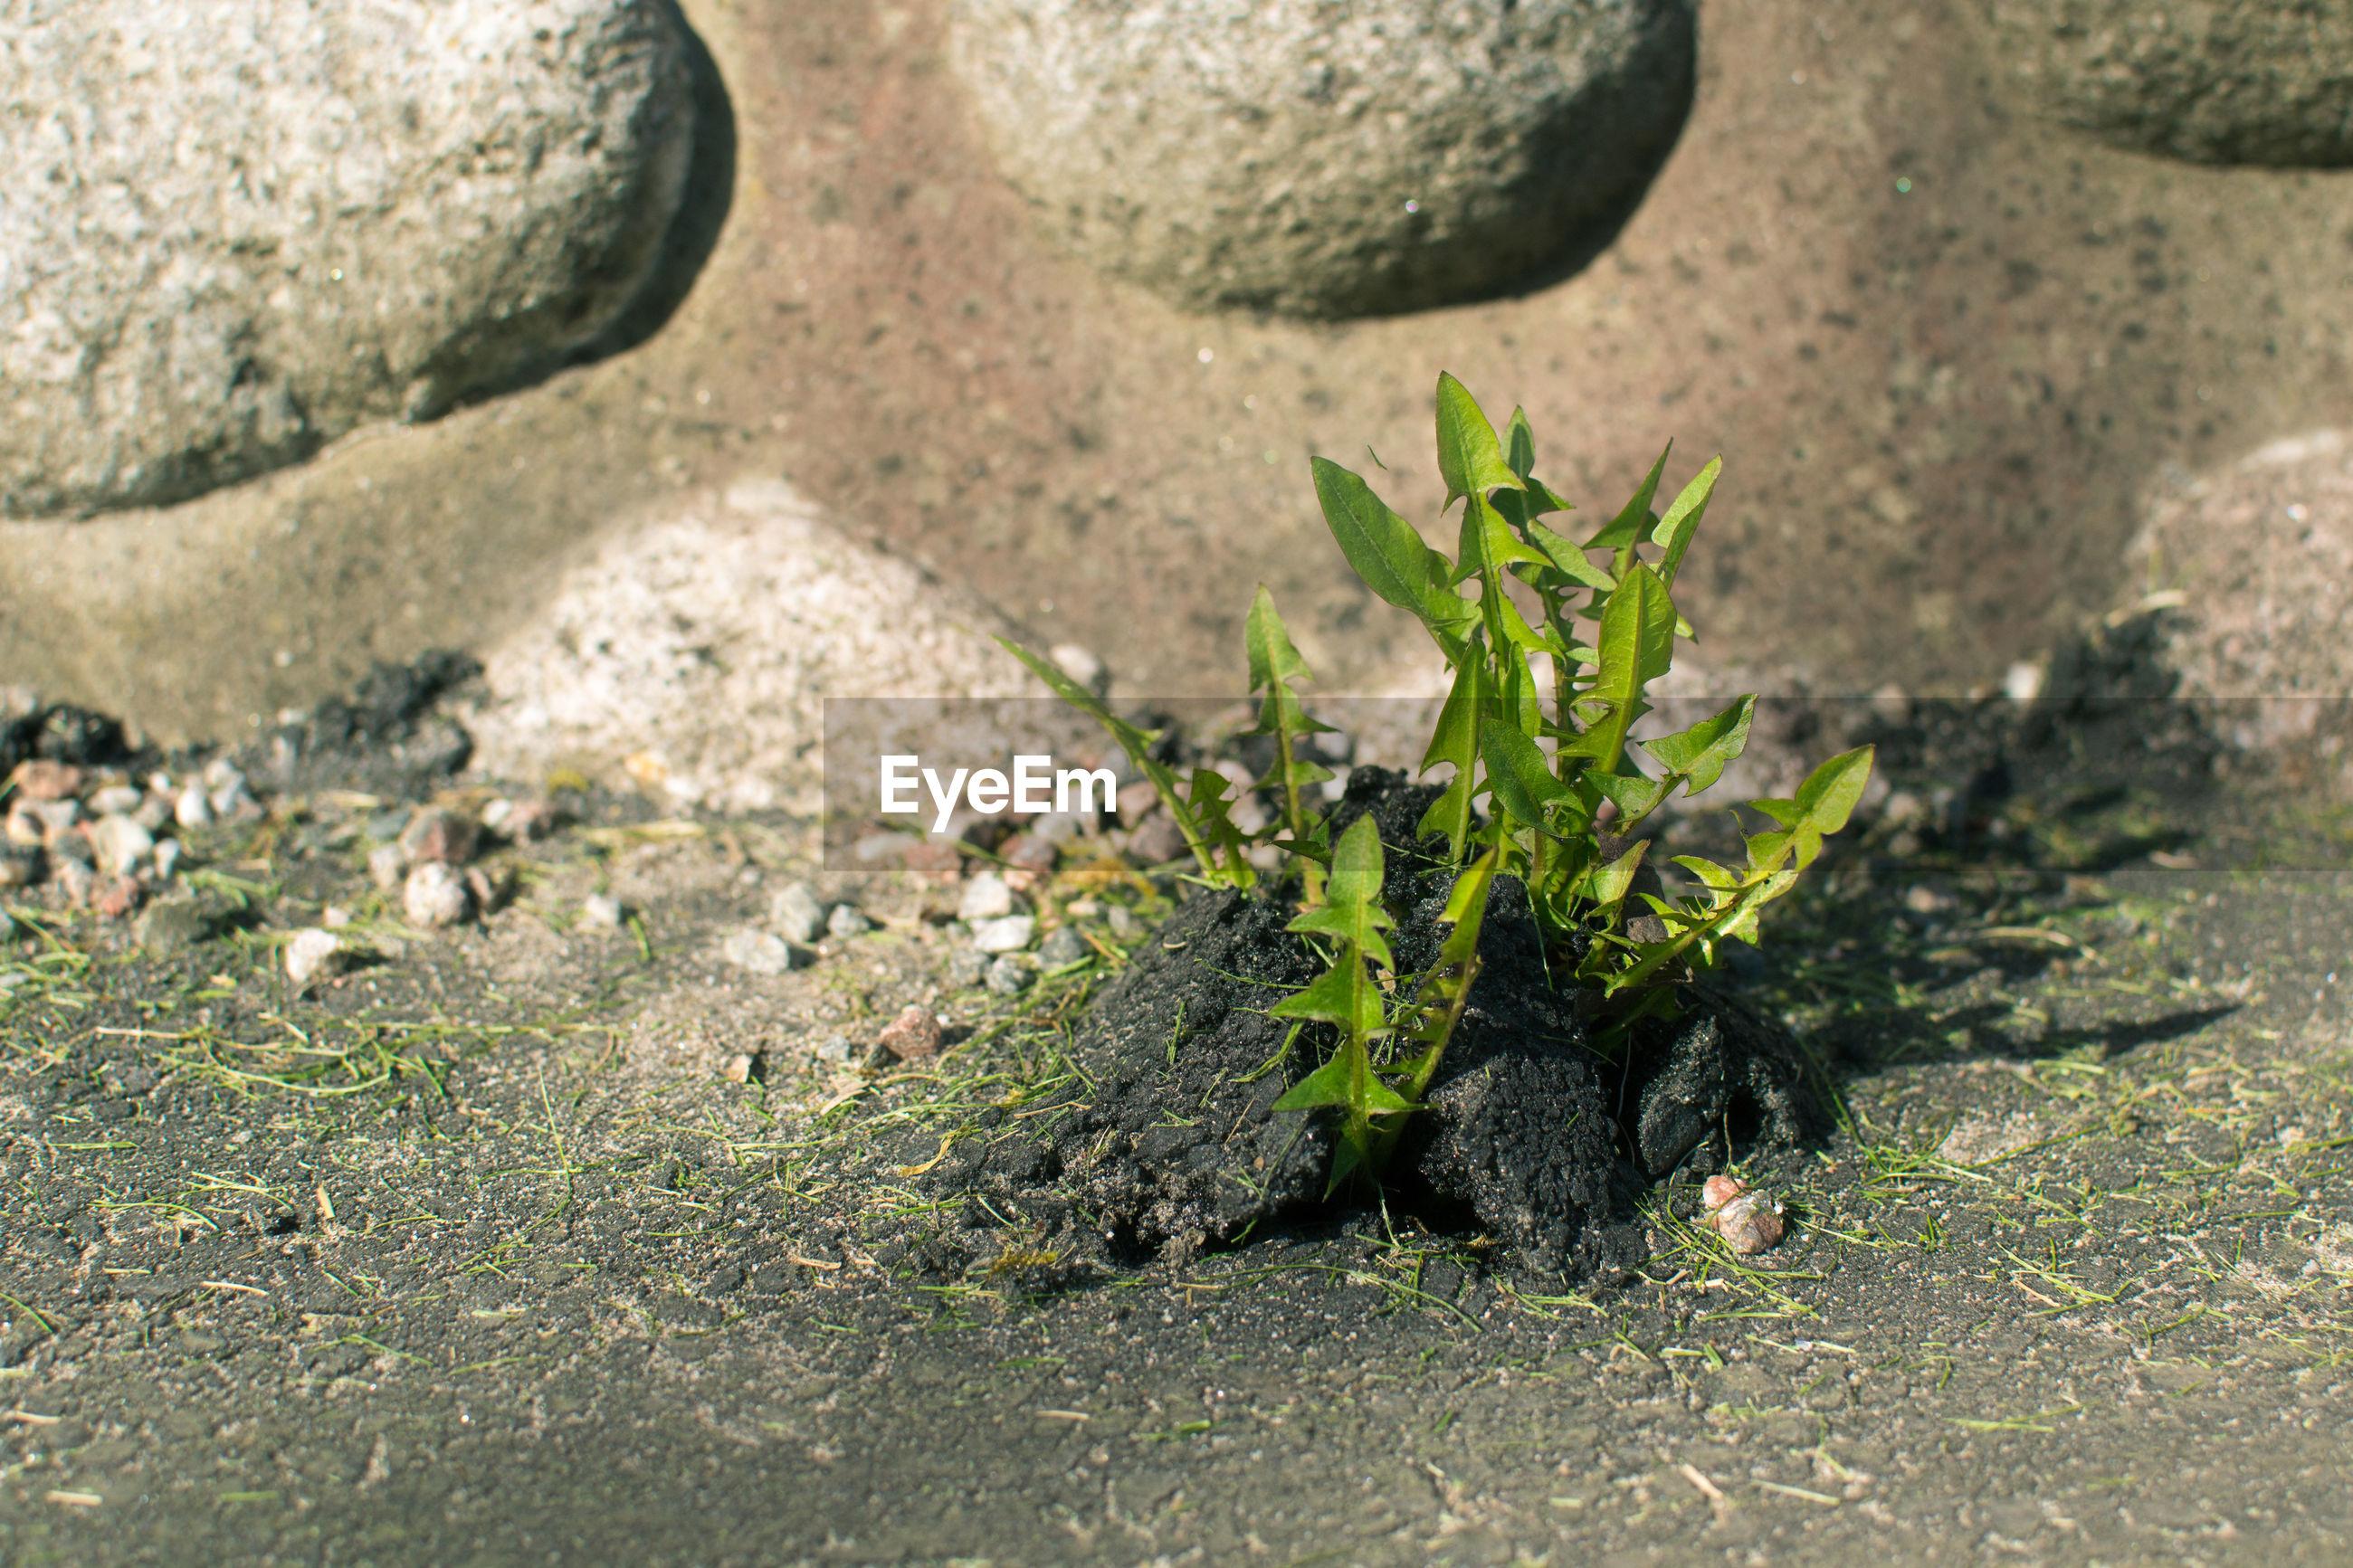 Close-up of plant growing on asphalt